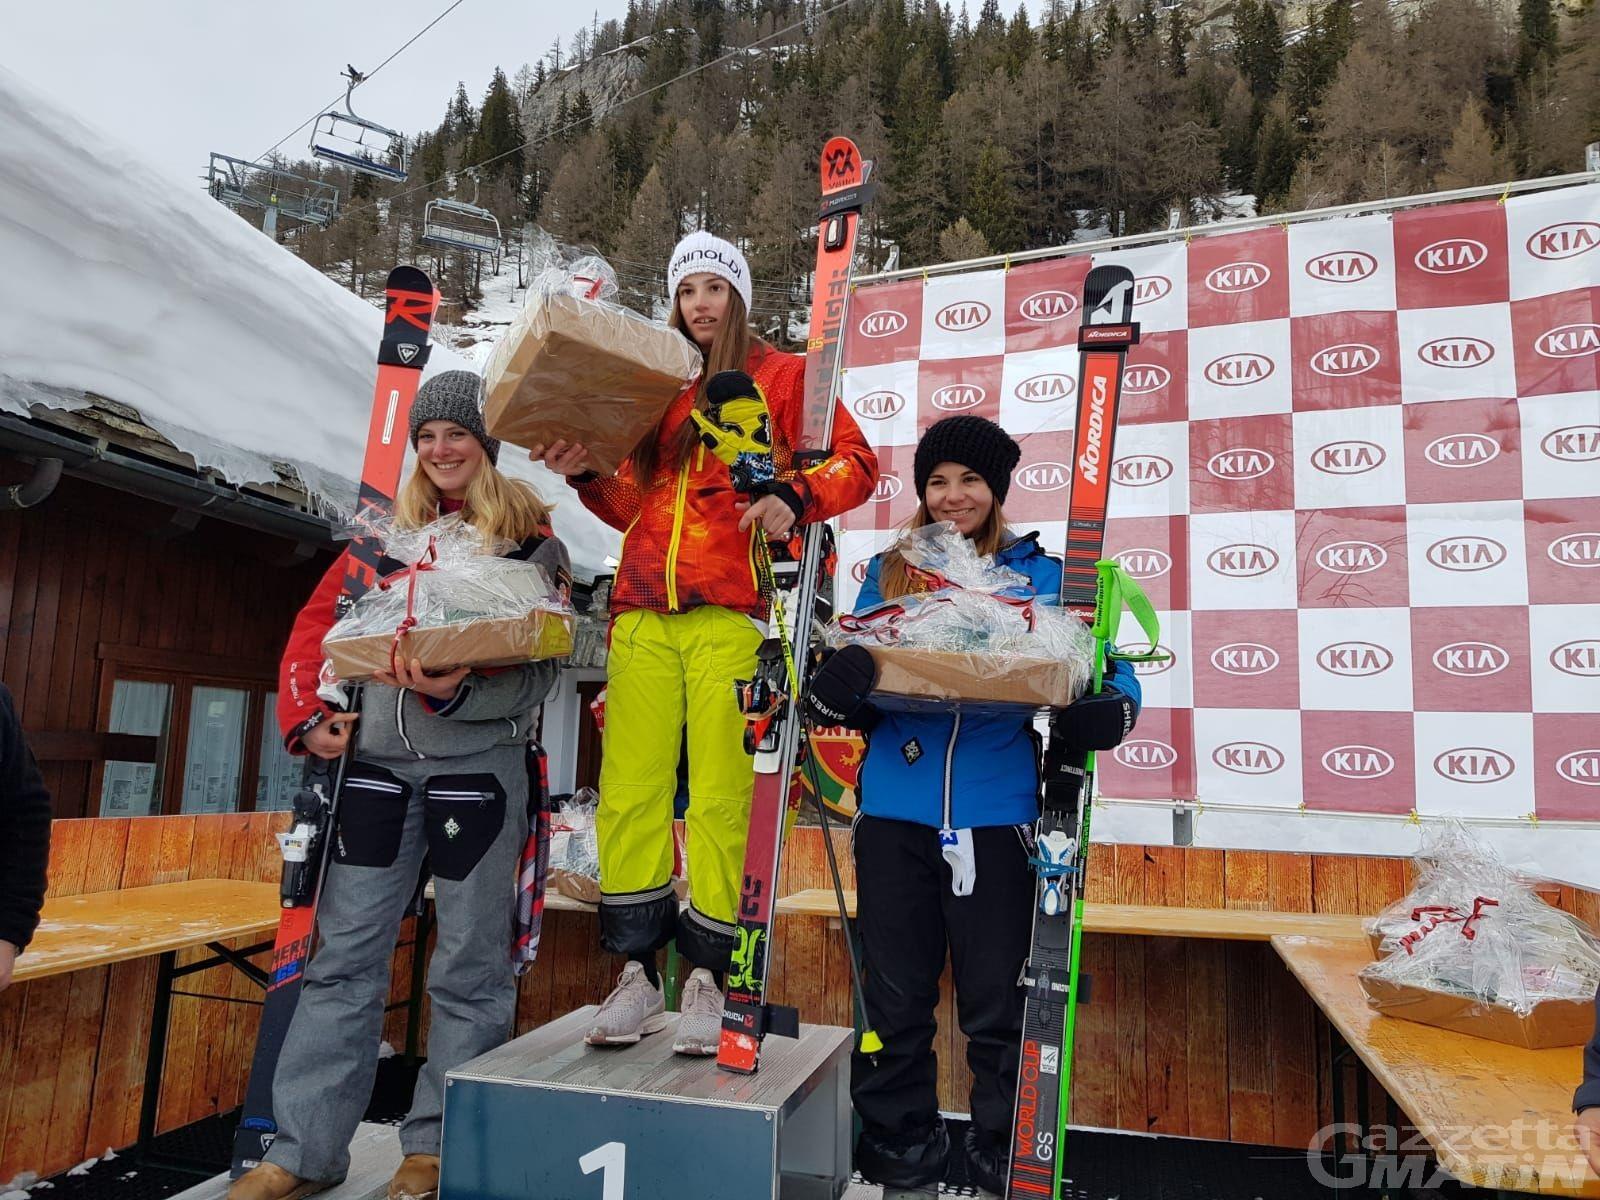 Sci alpino: Annette Belfrond seconda Aspiranti a Courmayeur